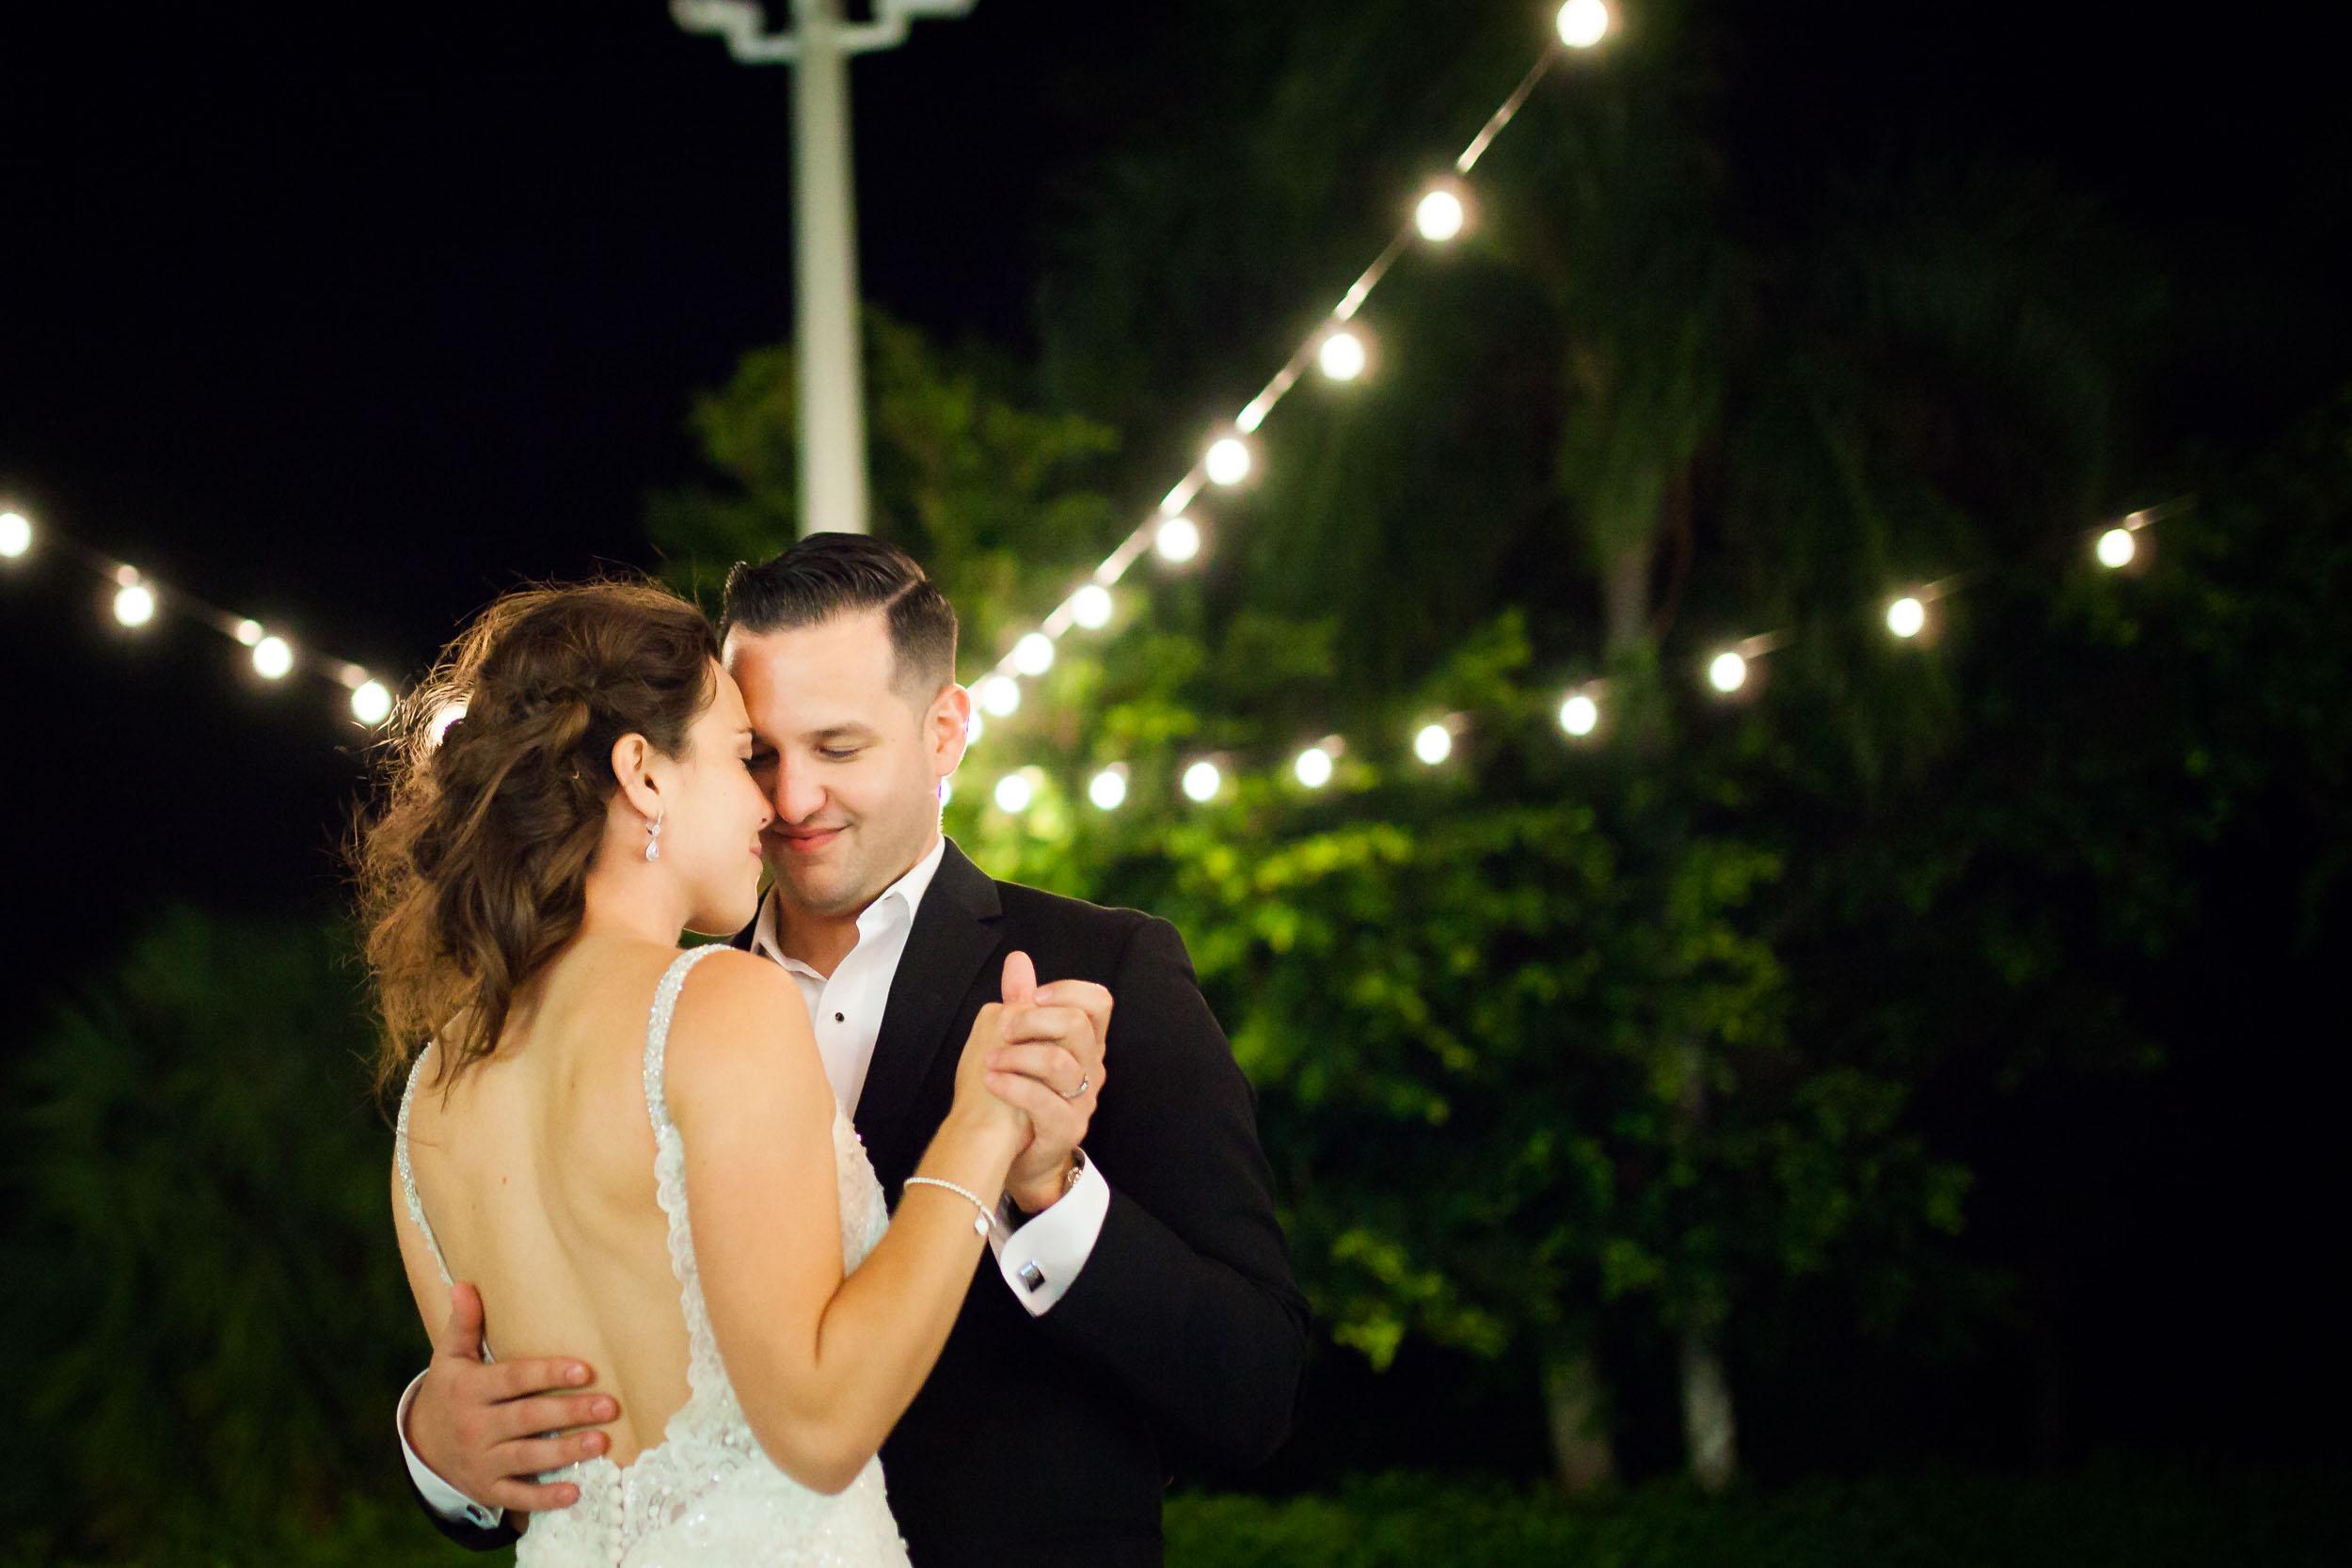 Flordia-Wedding-Photography-85.jpg